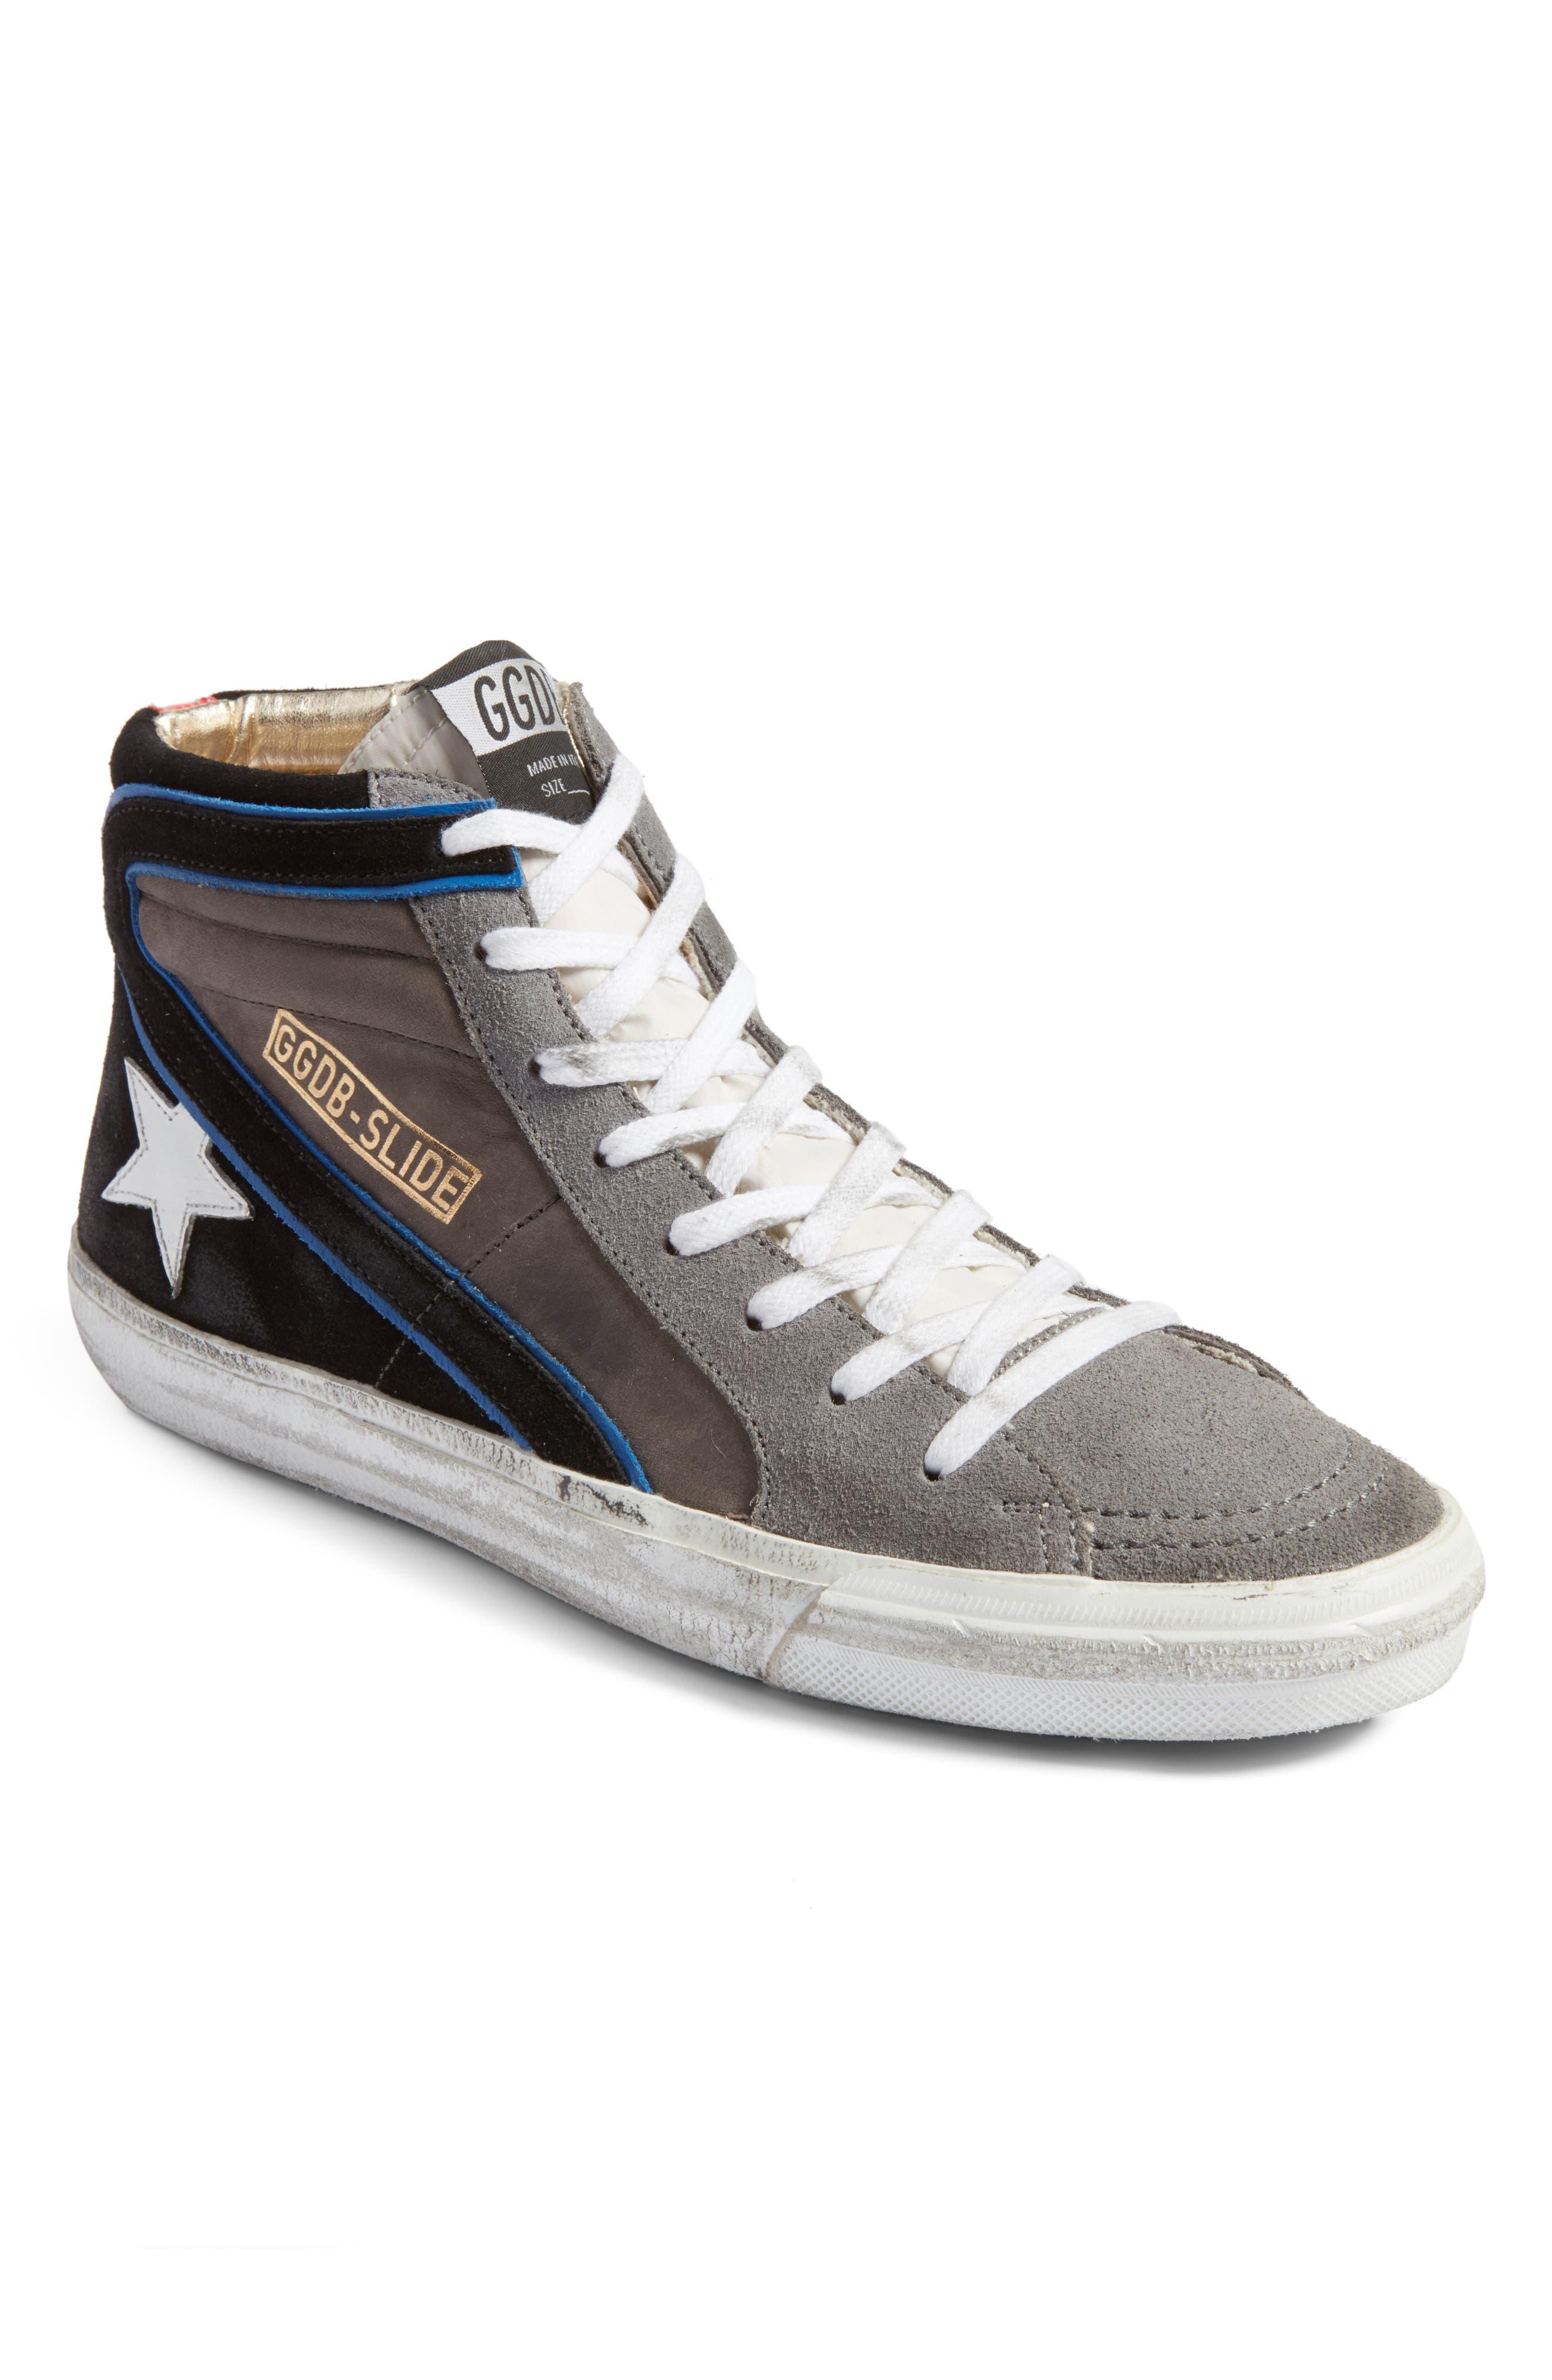 Slide High Top Sneaker,                         Main,                         color, 021